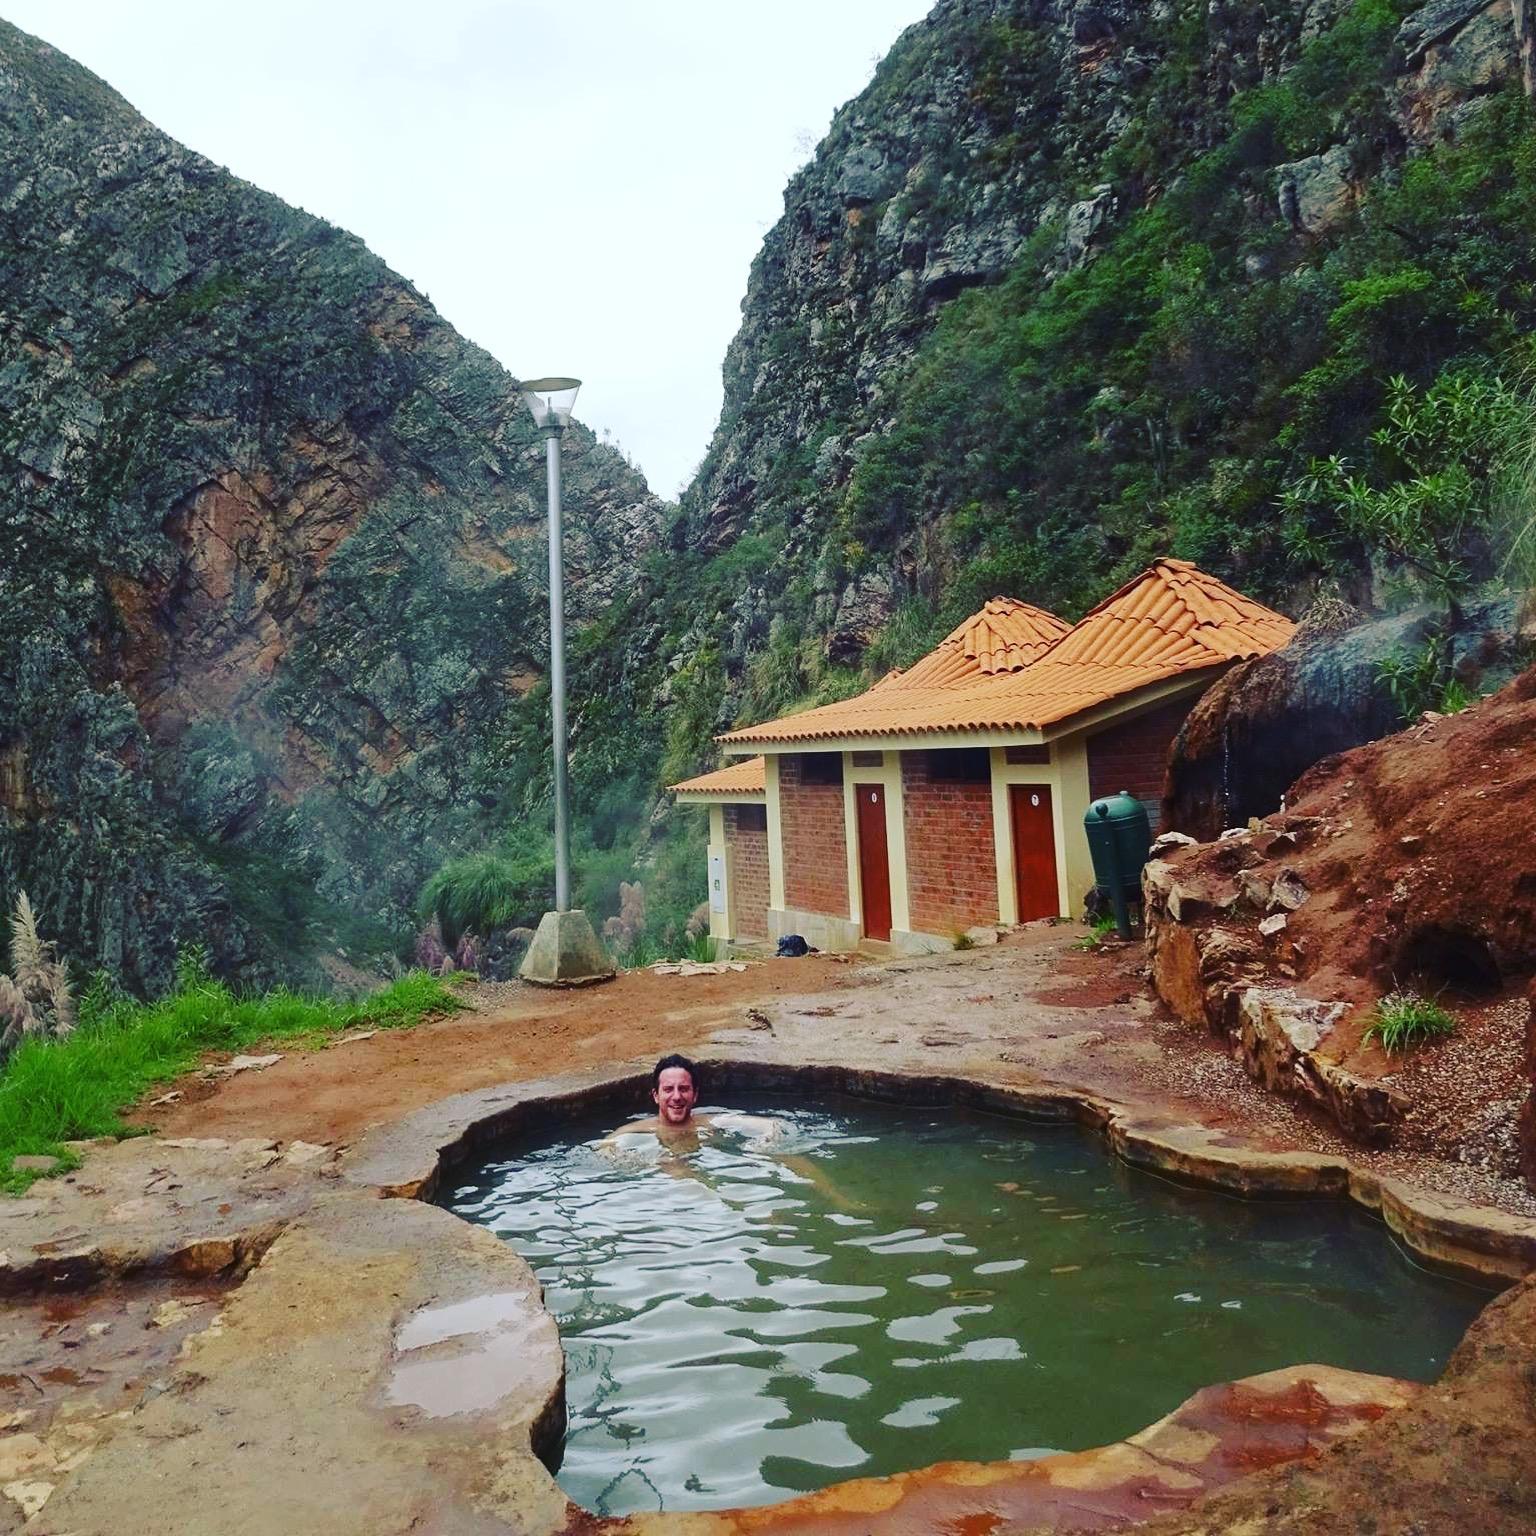 El Eden, hot springs resort